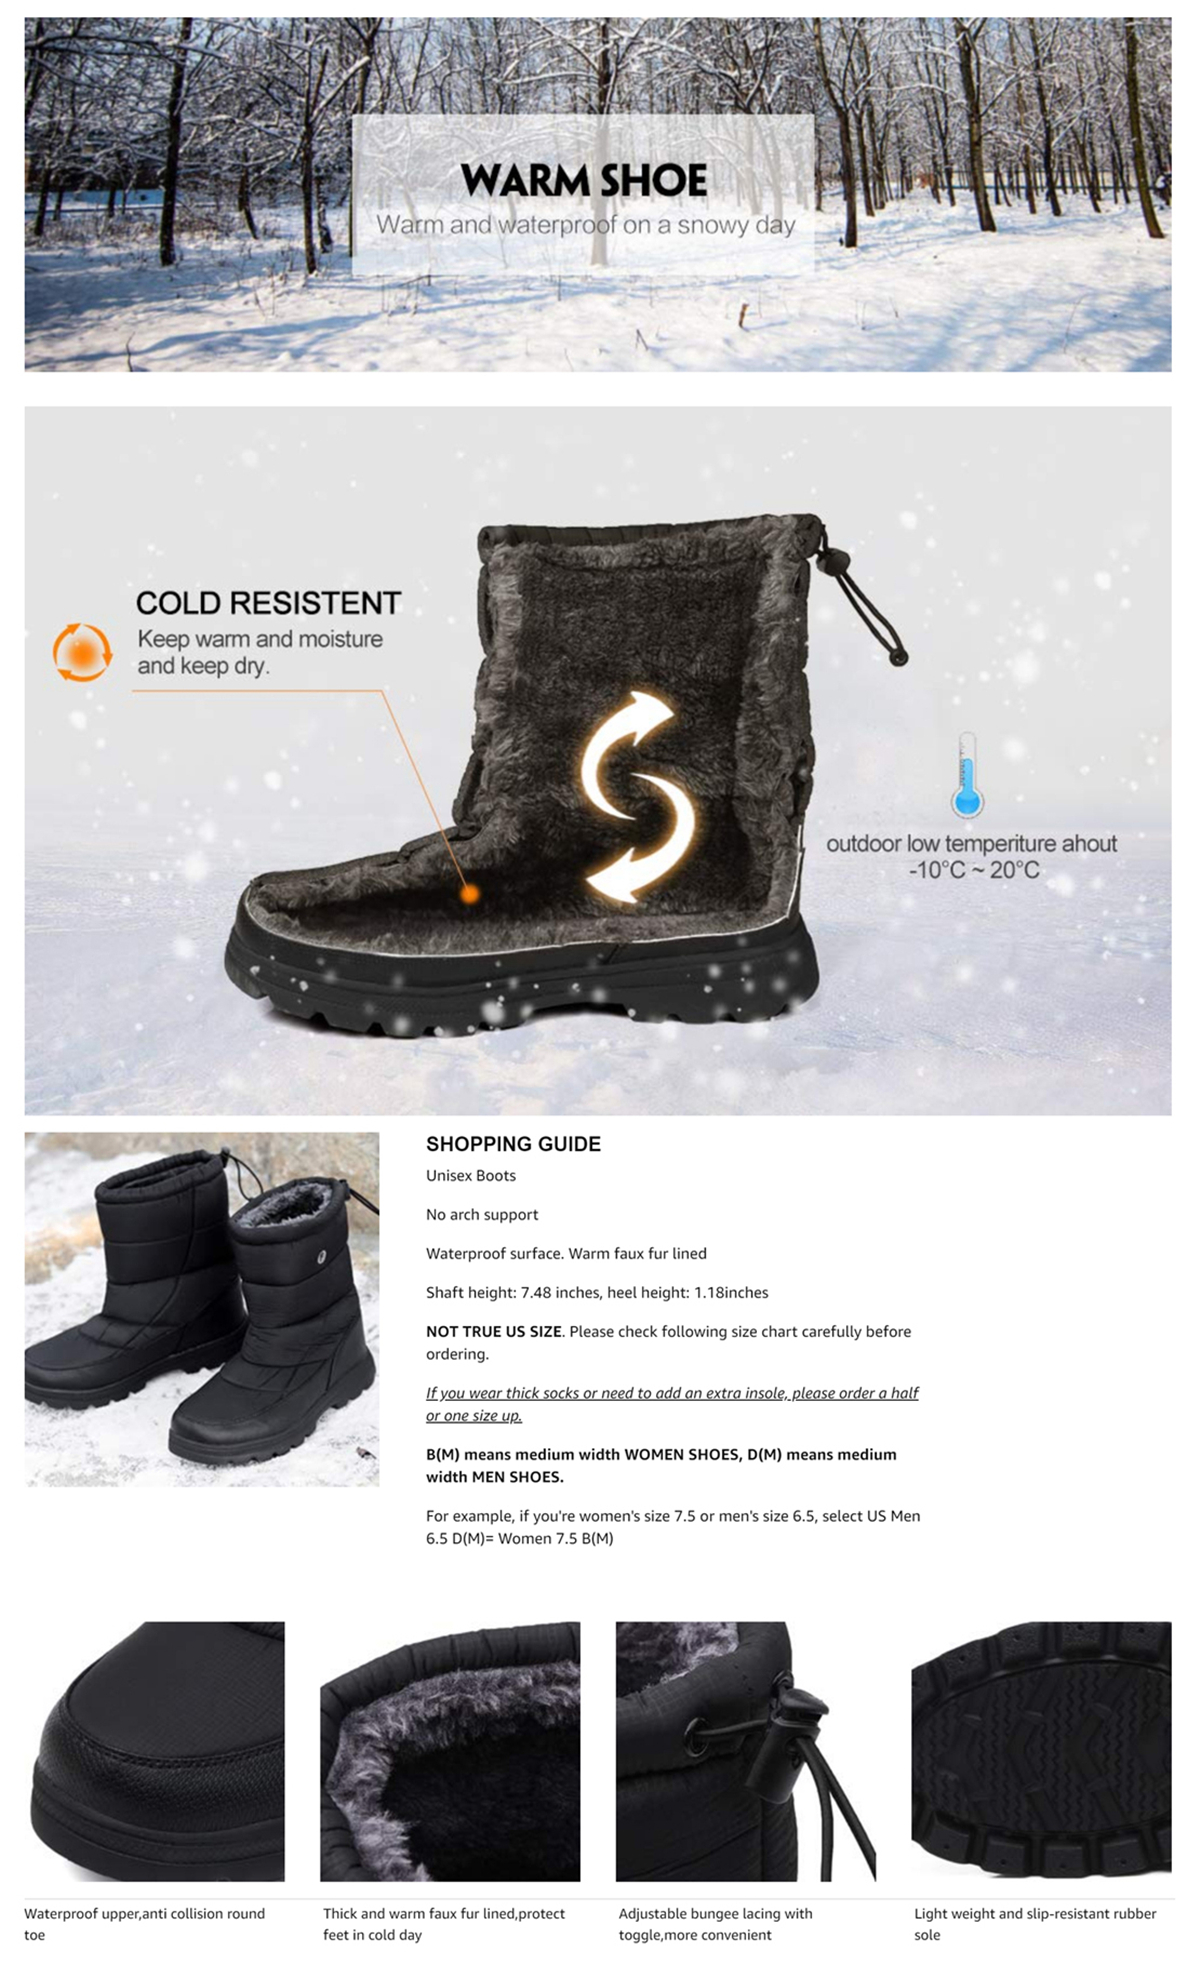 6f095f7107a Winter promotion - STQ Official Store - Aliexpress.com